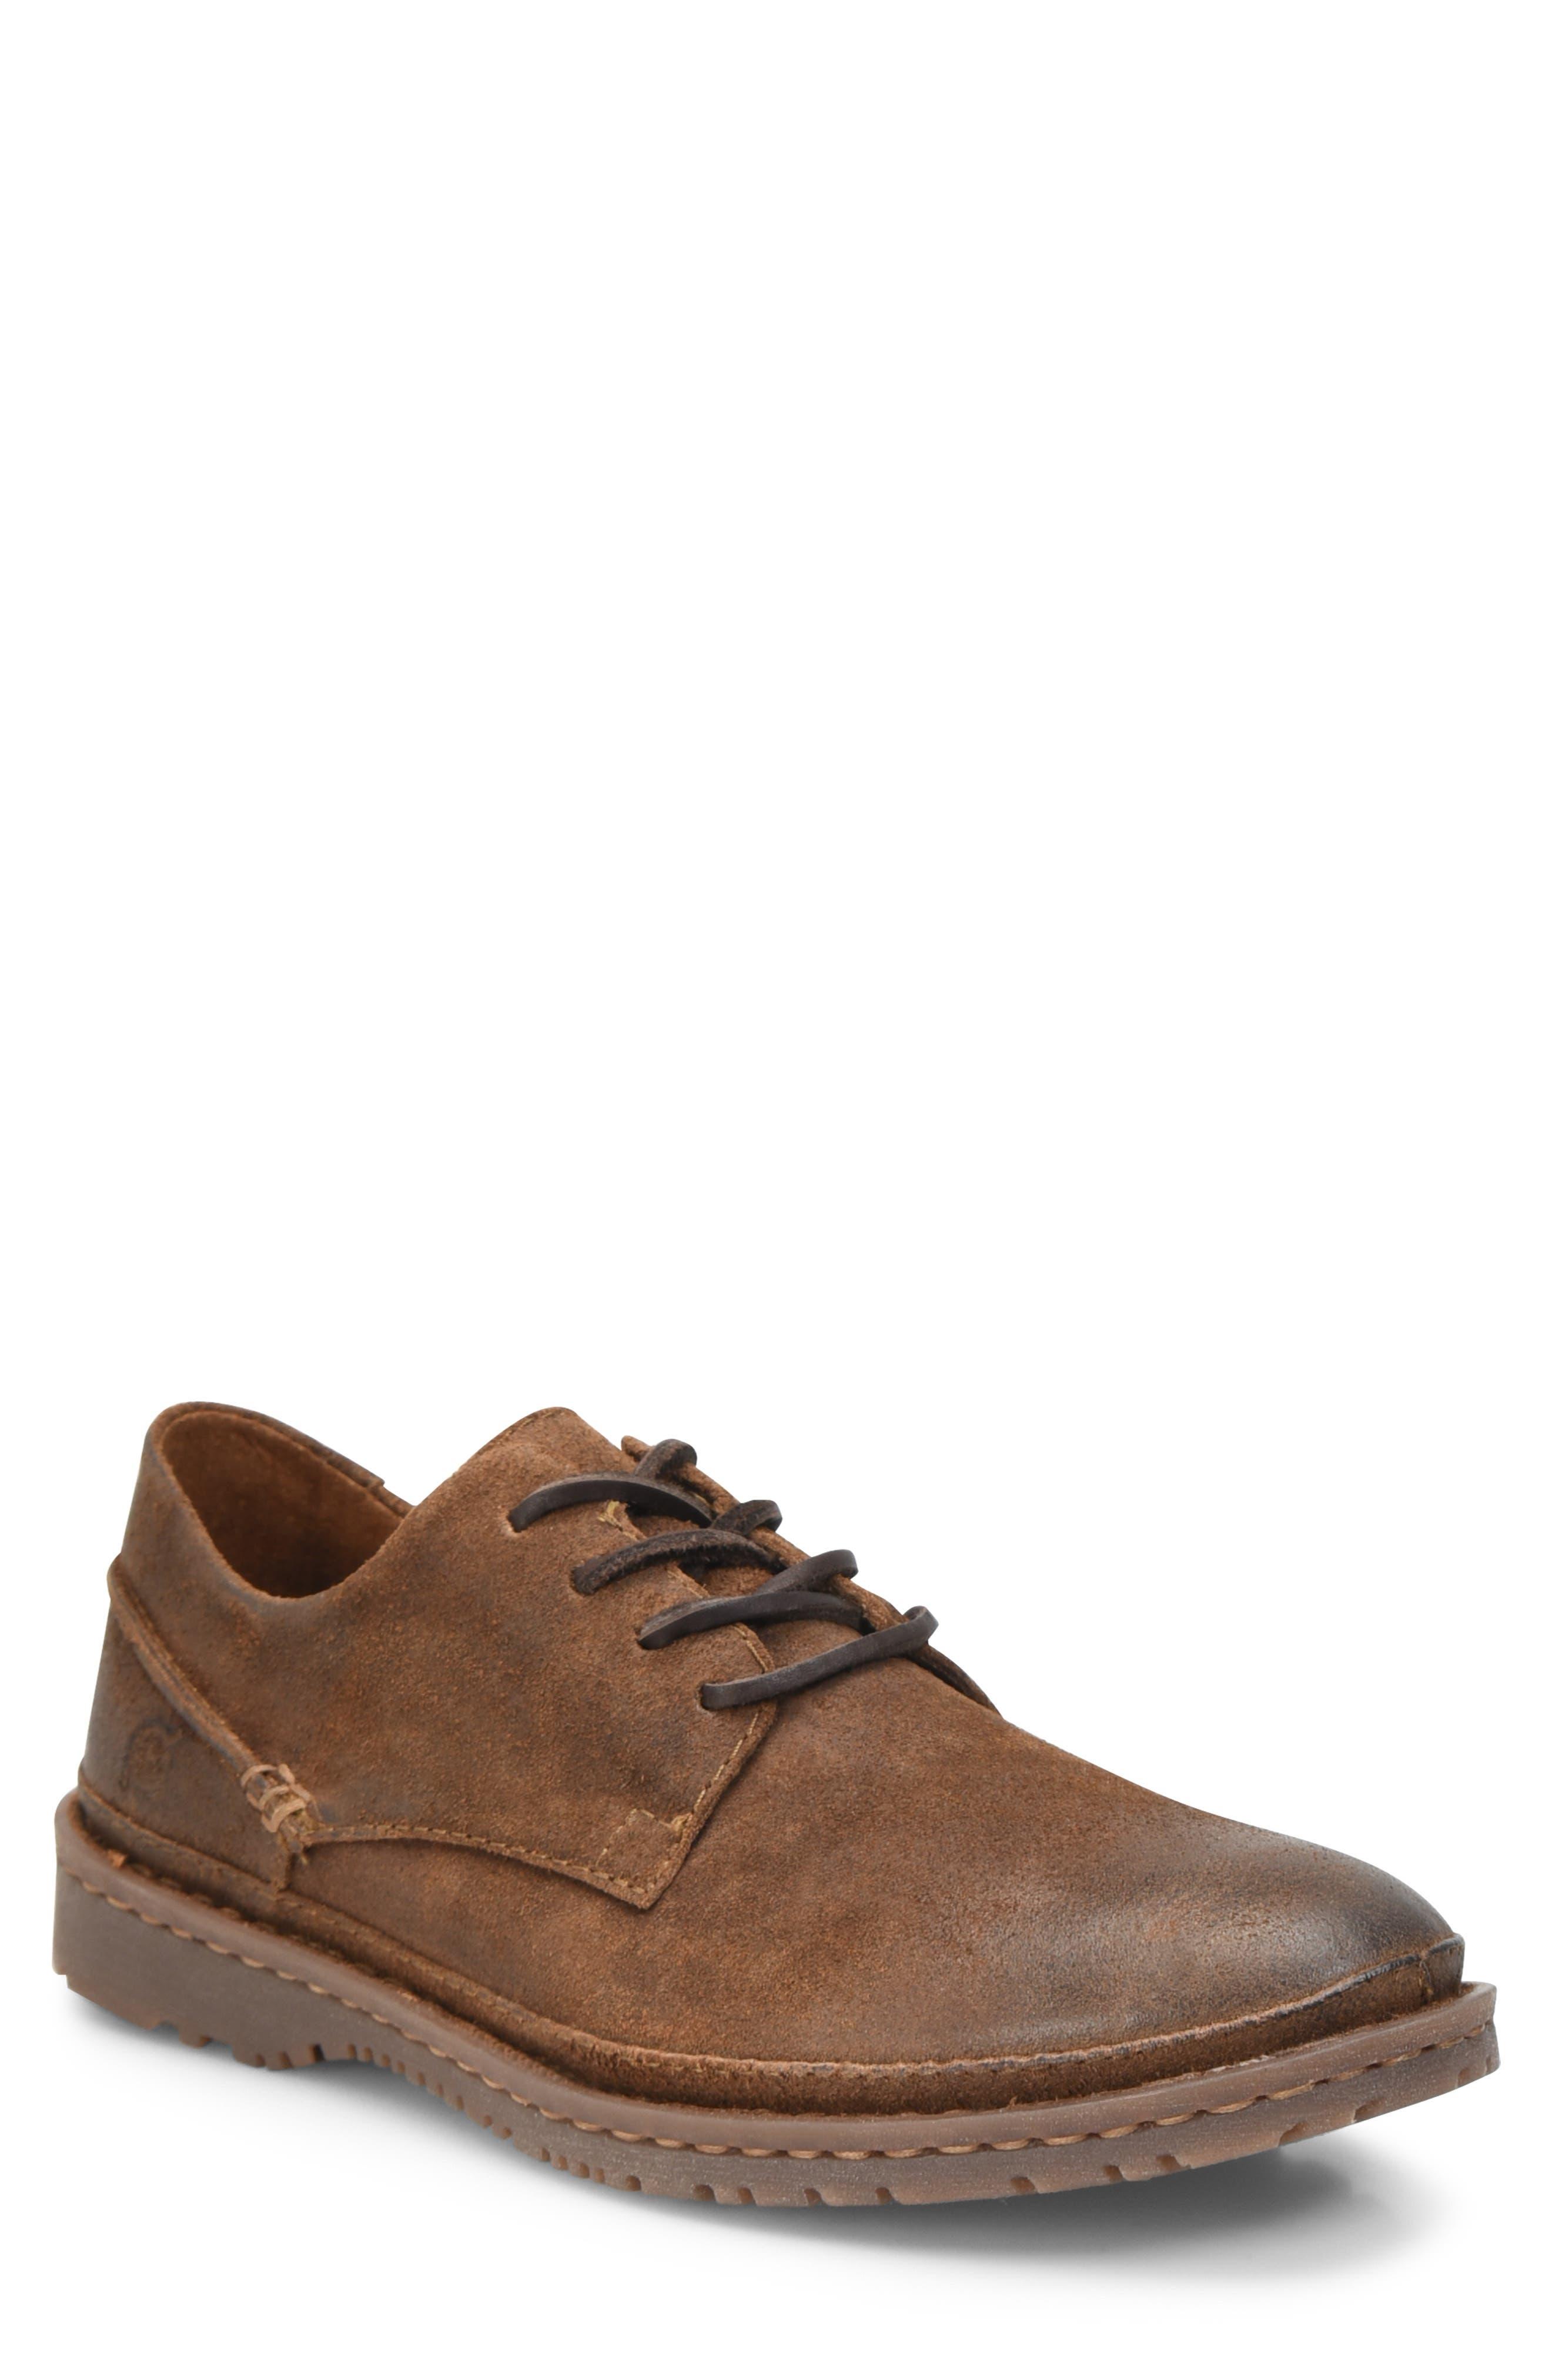 Gilles Plain Toe Derby,                         Main,                         color, Brown/Brown Leather